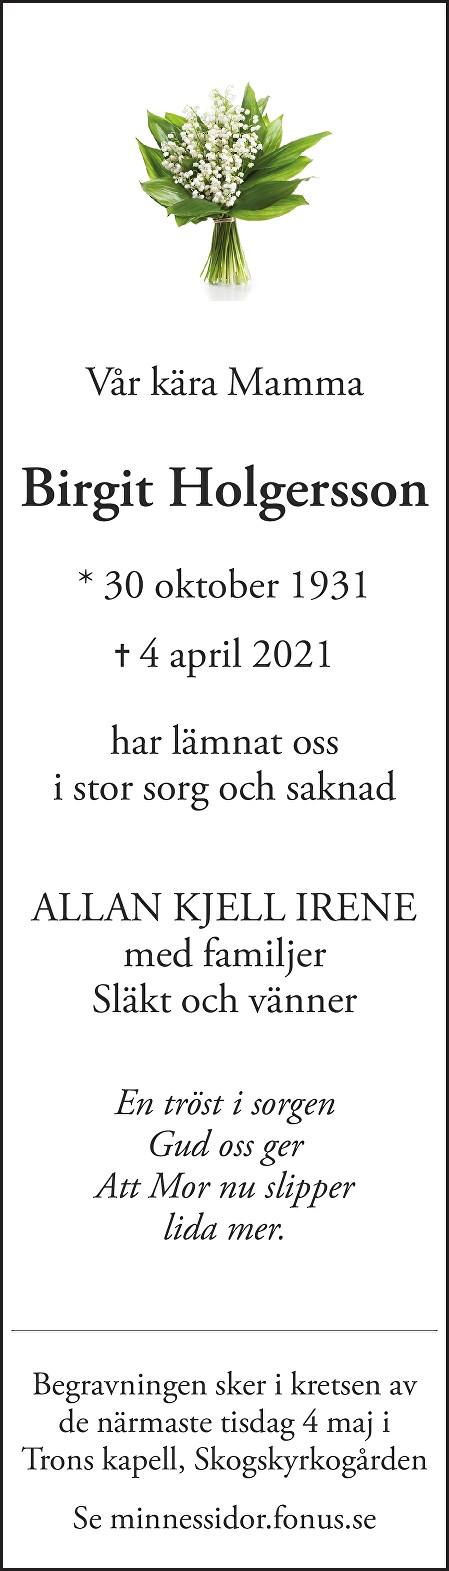 Birgit Holgersson Death notice